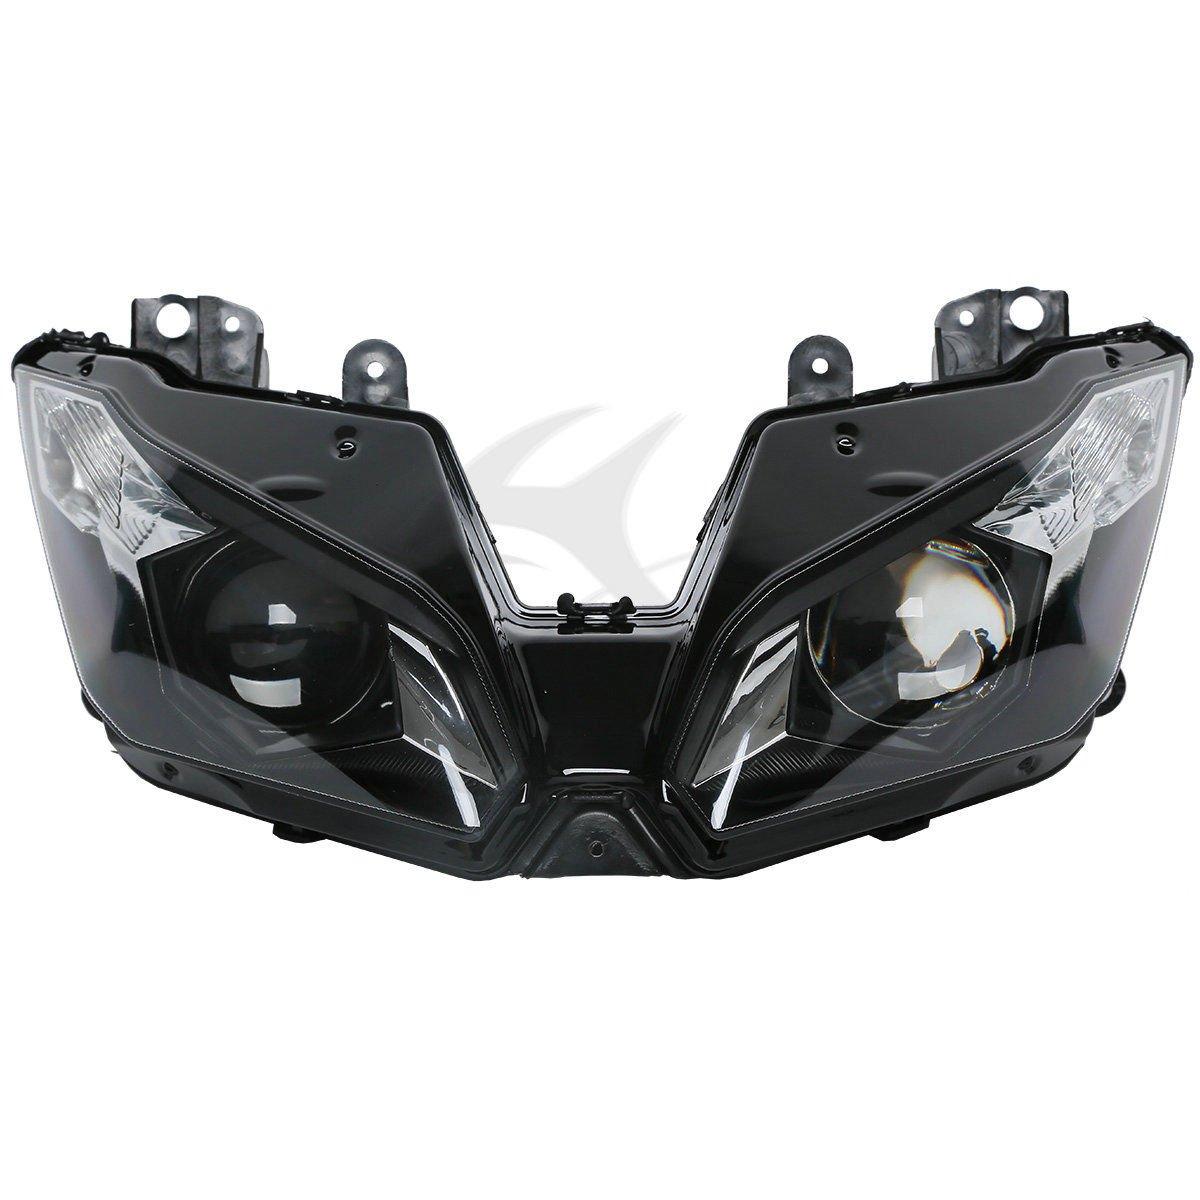 XFMT Headlight Headlamp Assembly Compatible with Kawasaki Ninja ZX6R ZX-6R ZX636 2005 2006 2005 2006